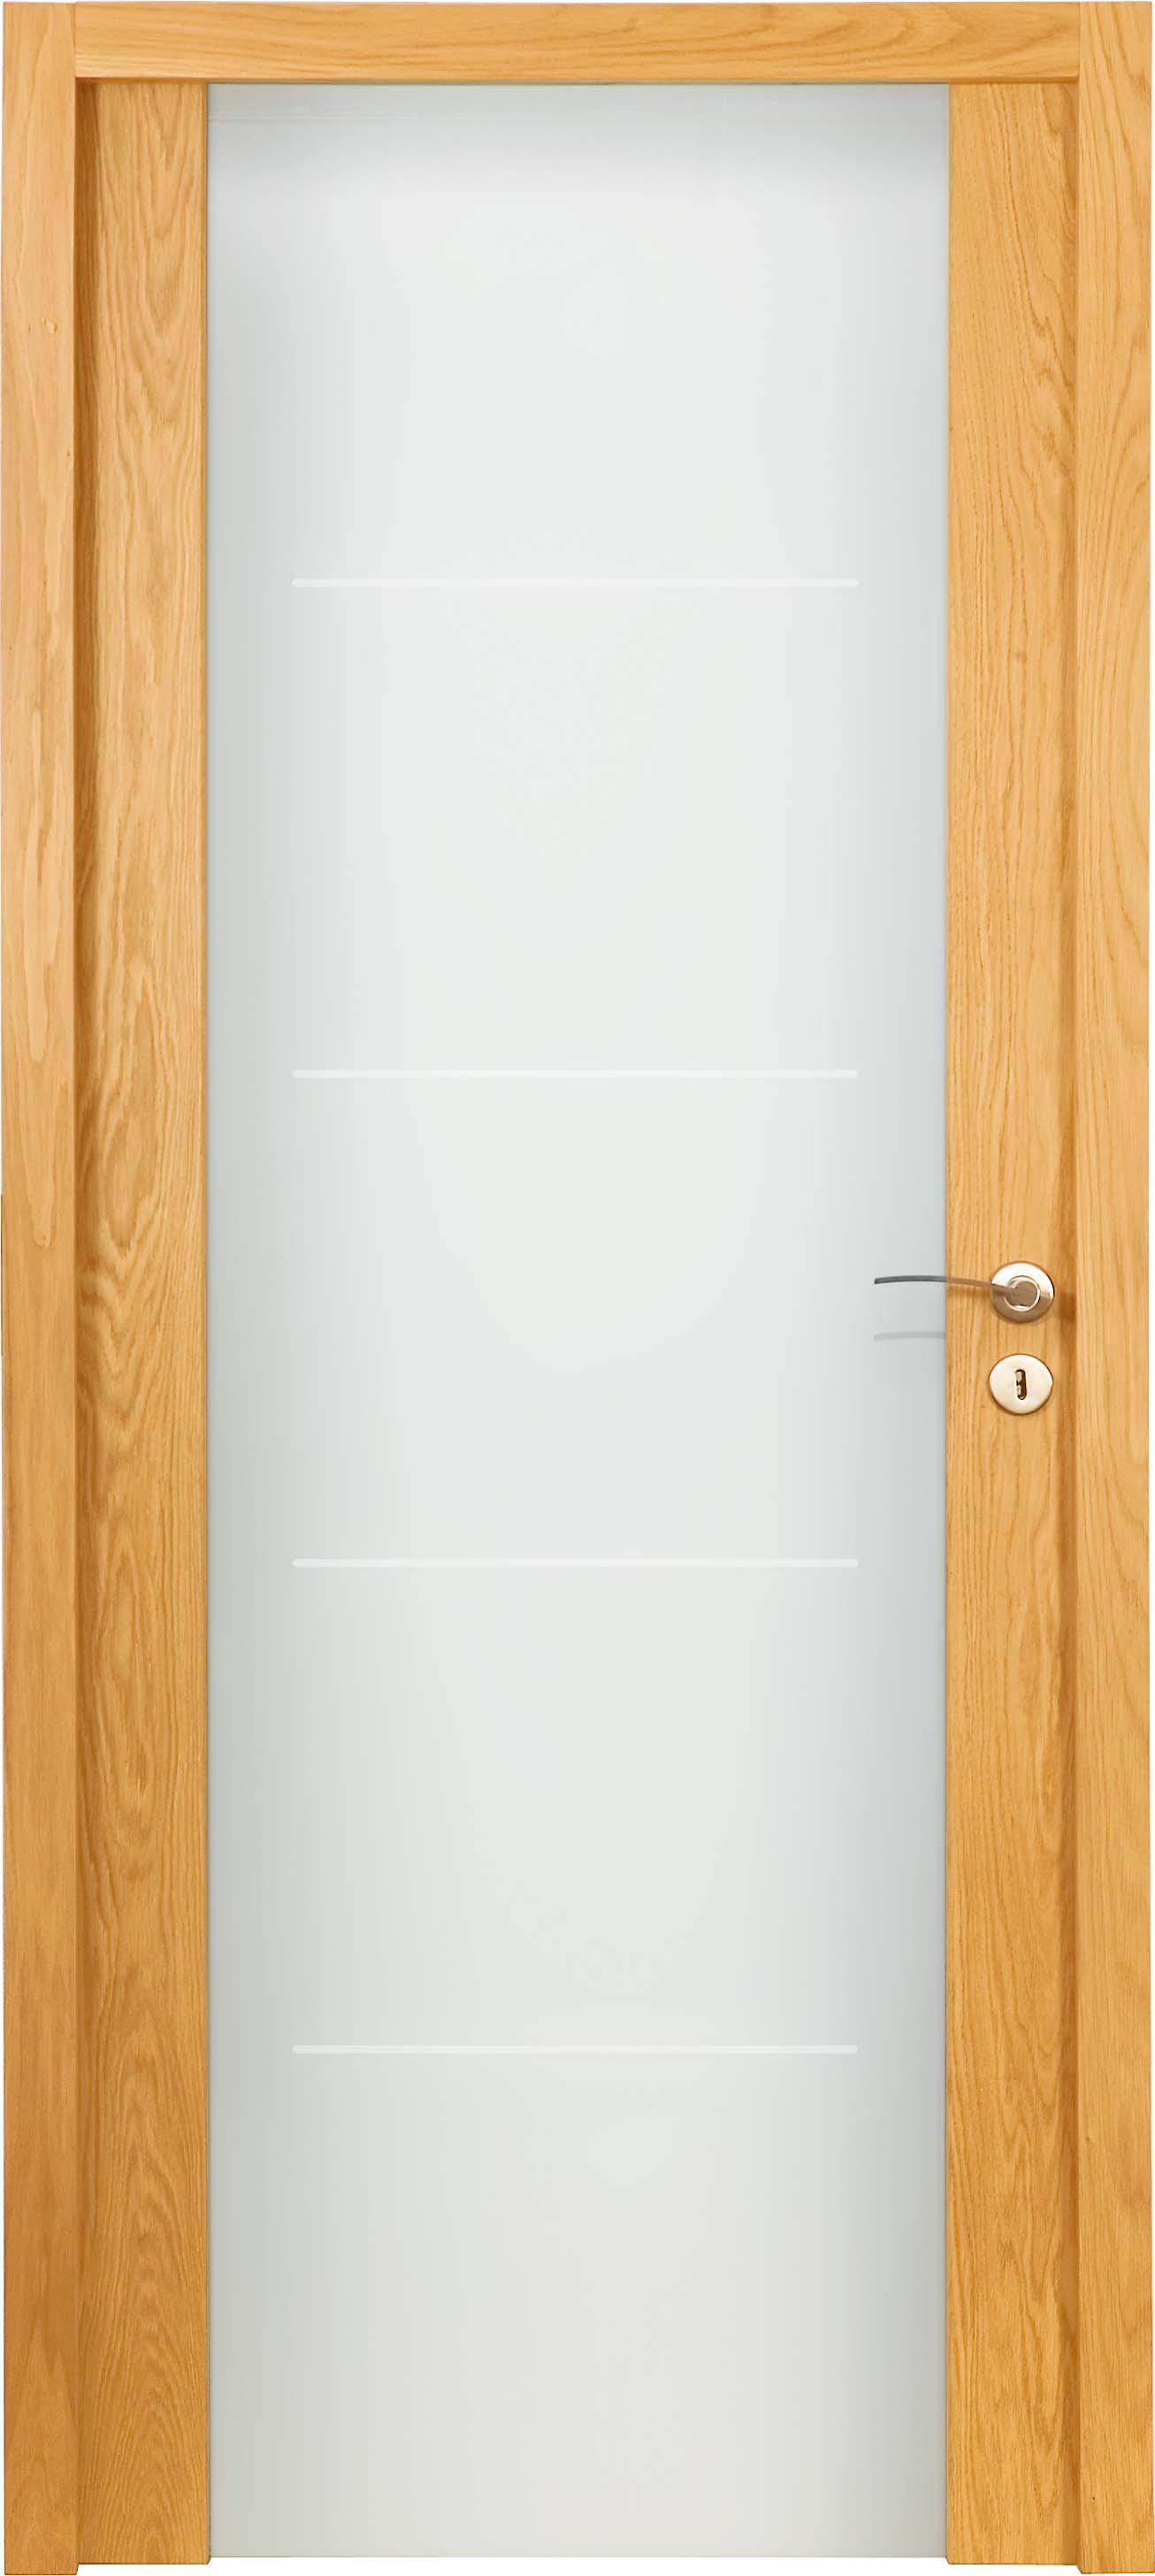 Porte proboporte bois massif ch ne verni mat mod le orcia Porte interieure basique